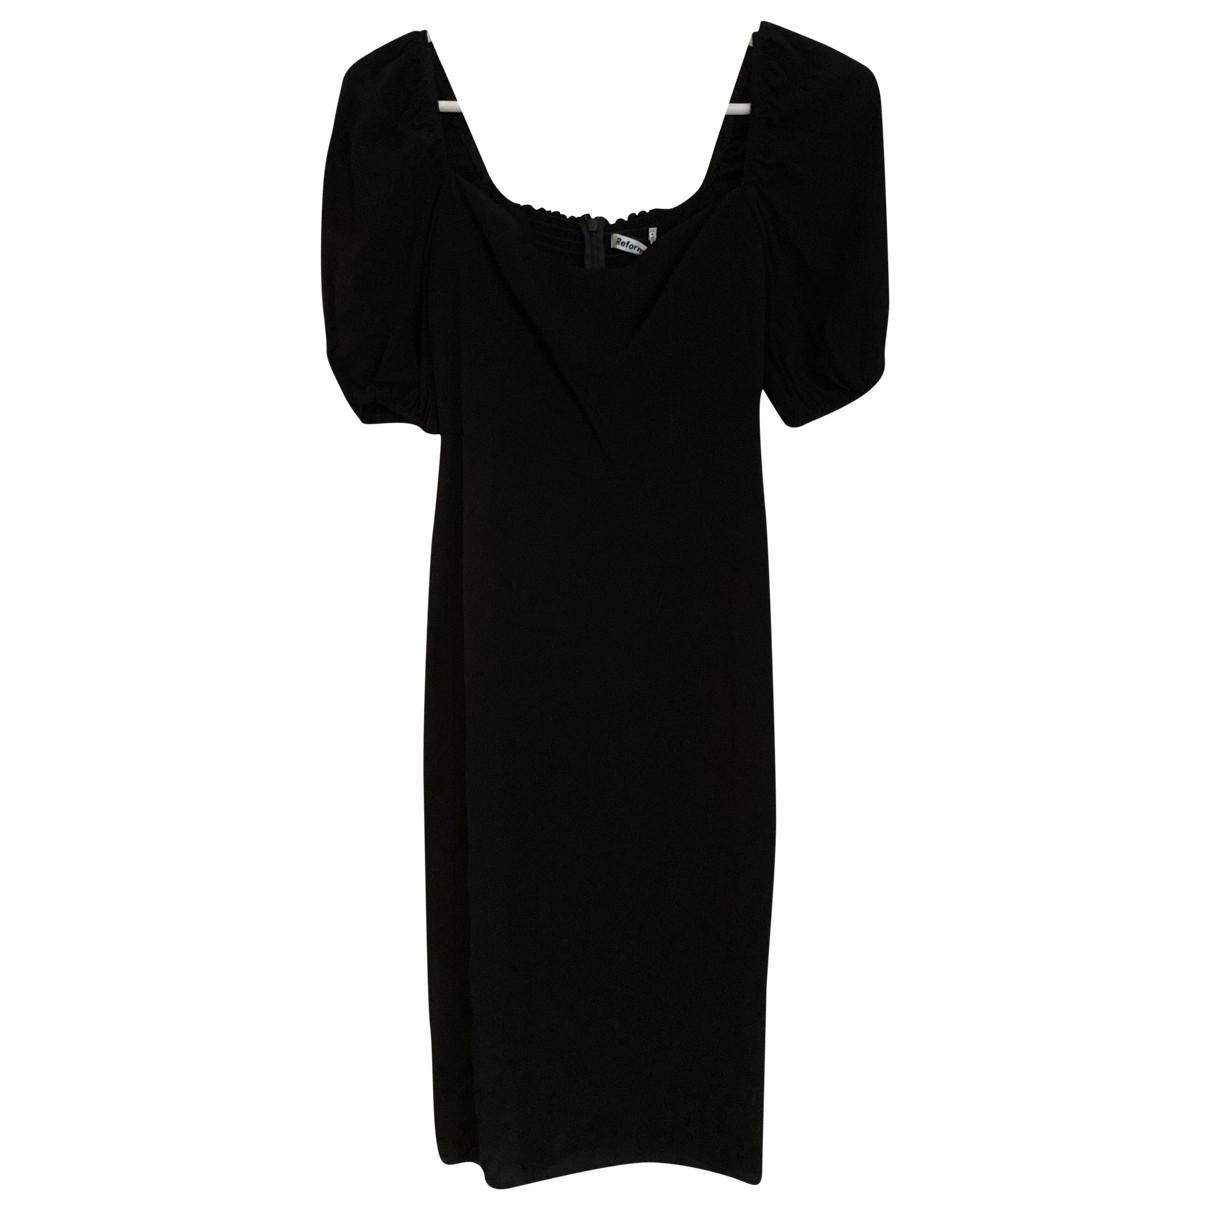 Reformation \N Black dress for Women XS International